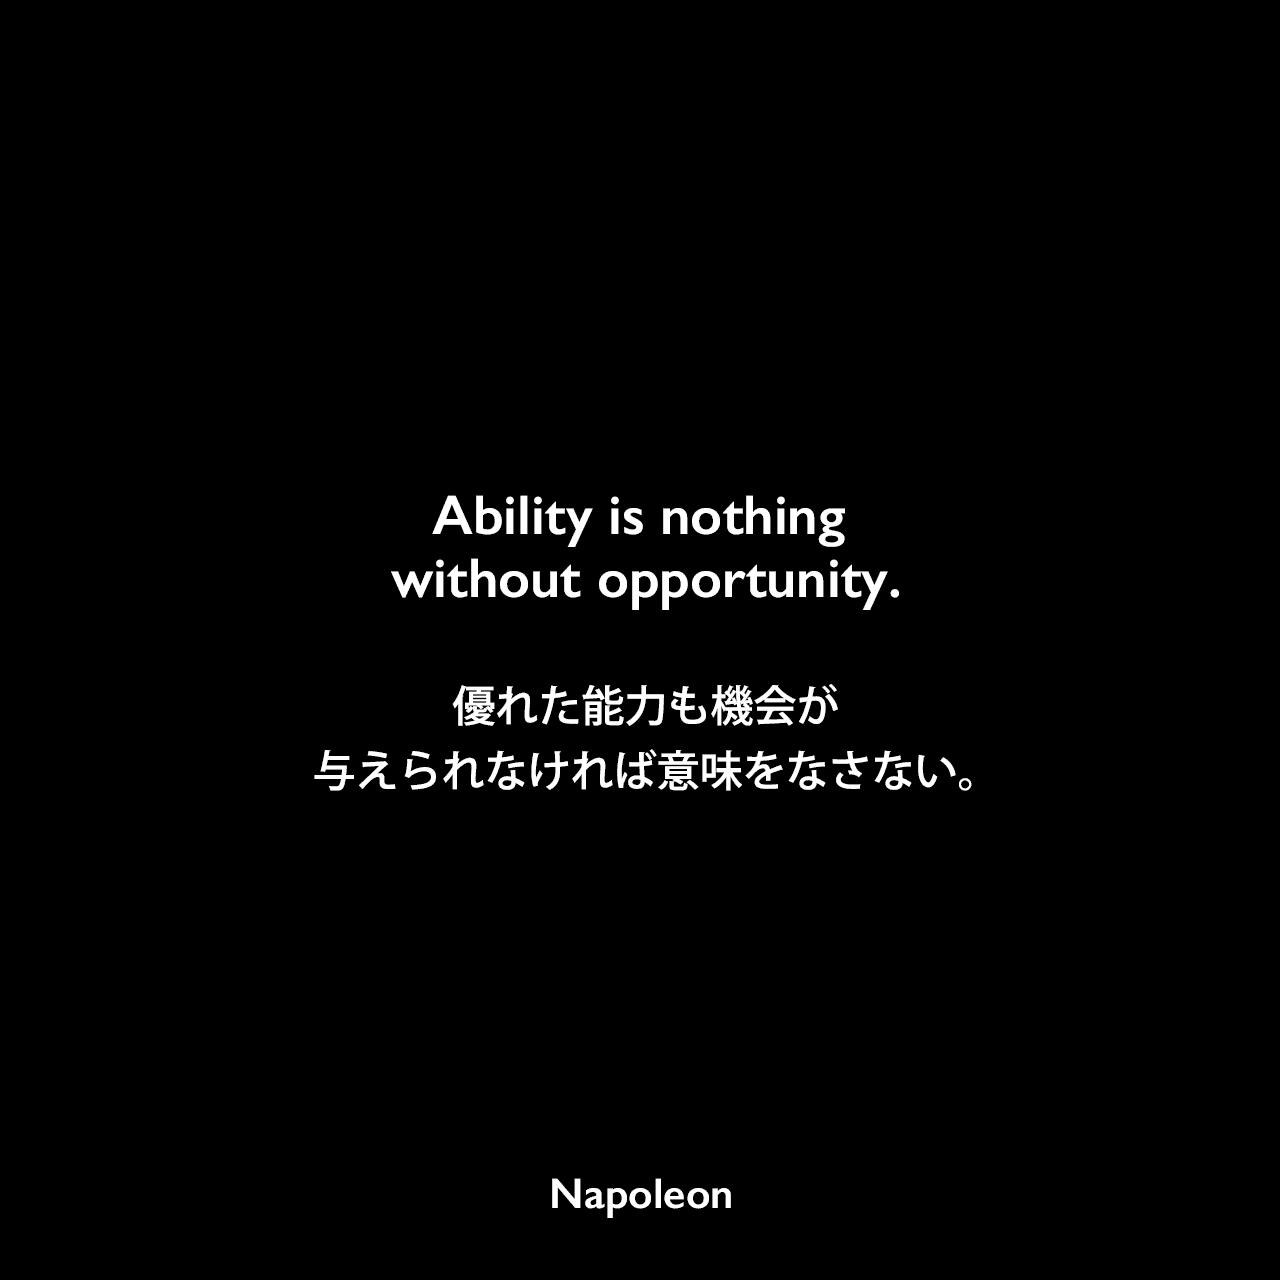 Ability is nothing without opportunity.優れた能力も機会が与えられなければ意味をなさない。Napoleon